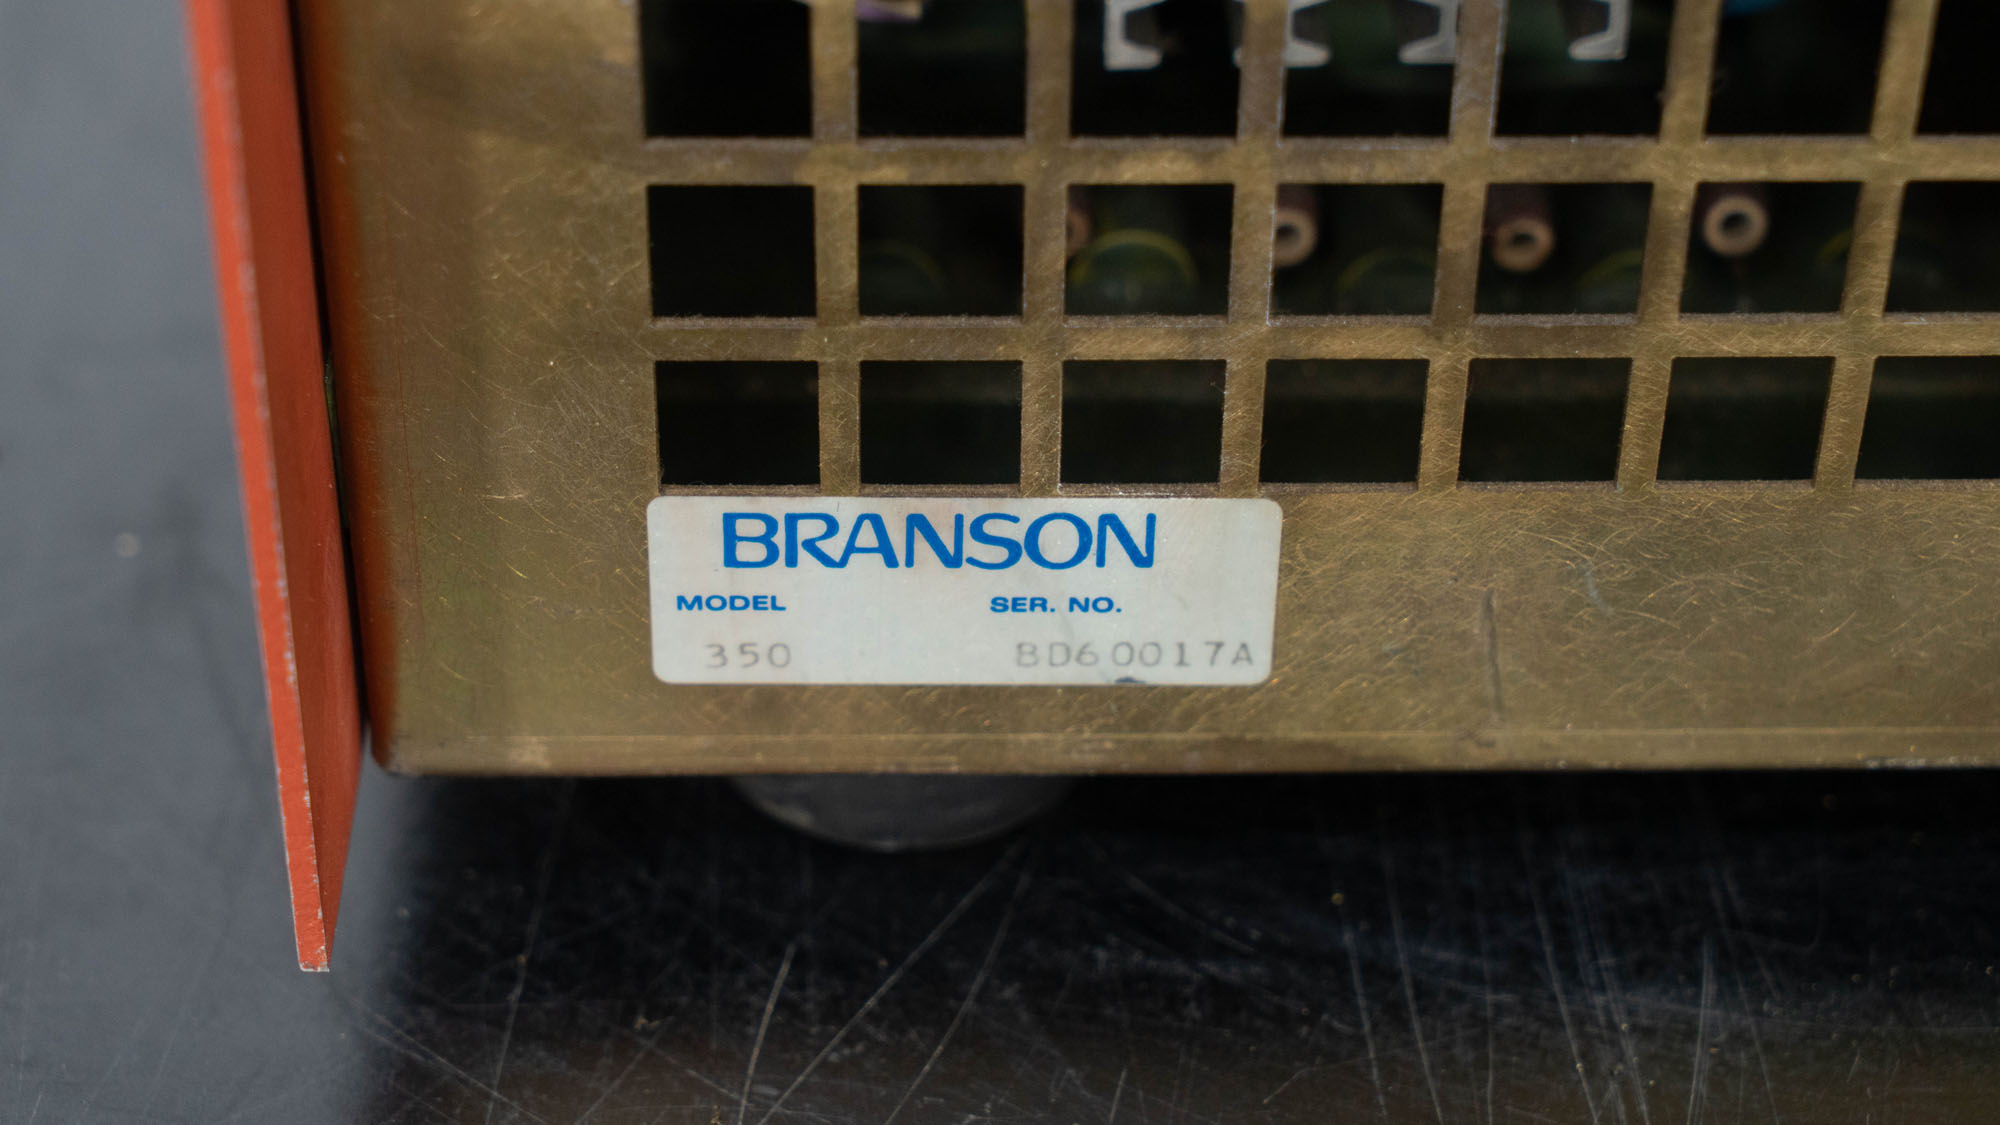 Branson Cell Disruptor, Model 350